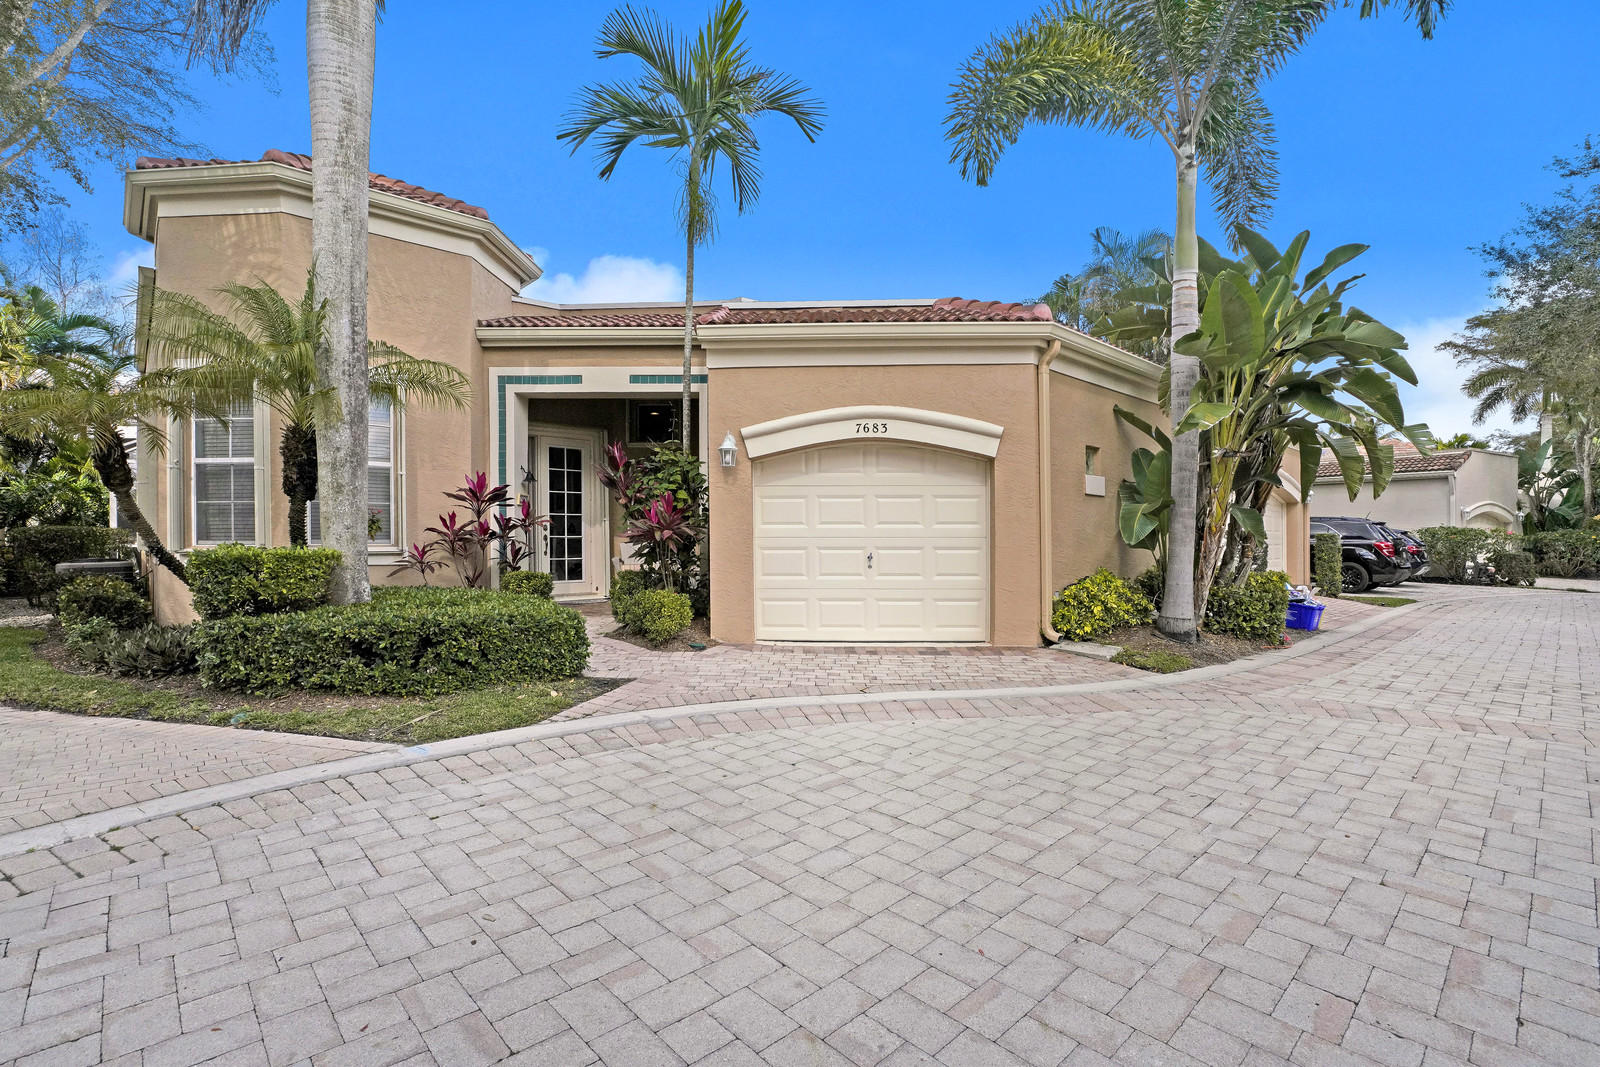 7683 Dahlia Court, West Palm Beach, Florida 33412, 2 Bedrooms Bedrooms, ,2 BathroomsBathrooms,A,Single family,Dahlia,RX-10505985